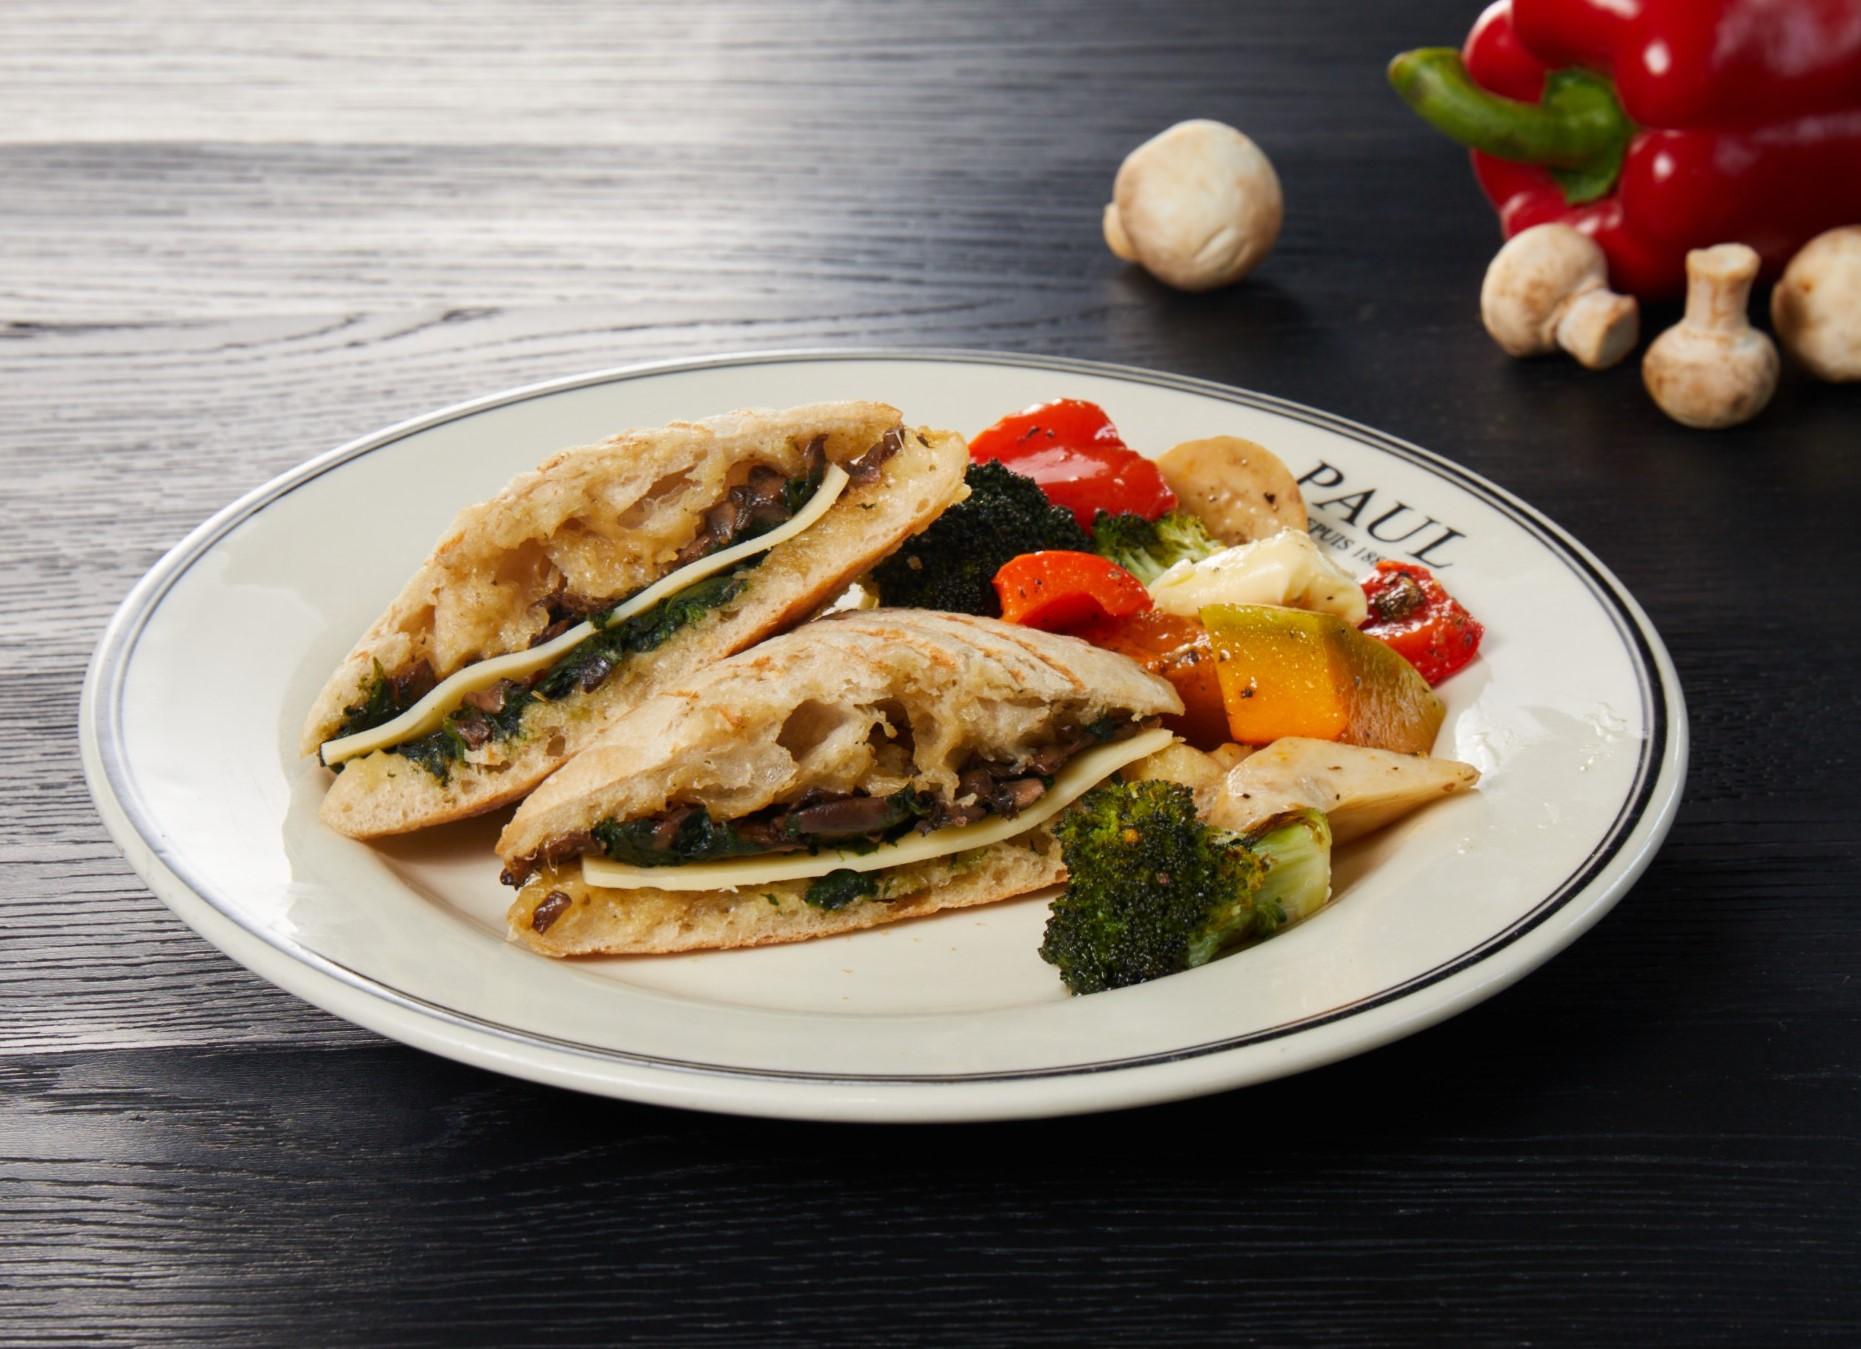 野菇菠菜起司帕尼尼 Cheese Panini with Mushroom Spinach